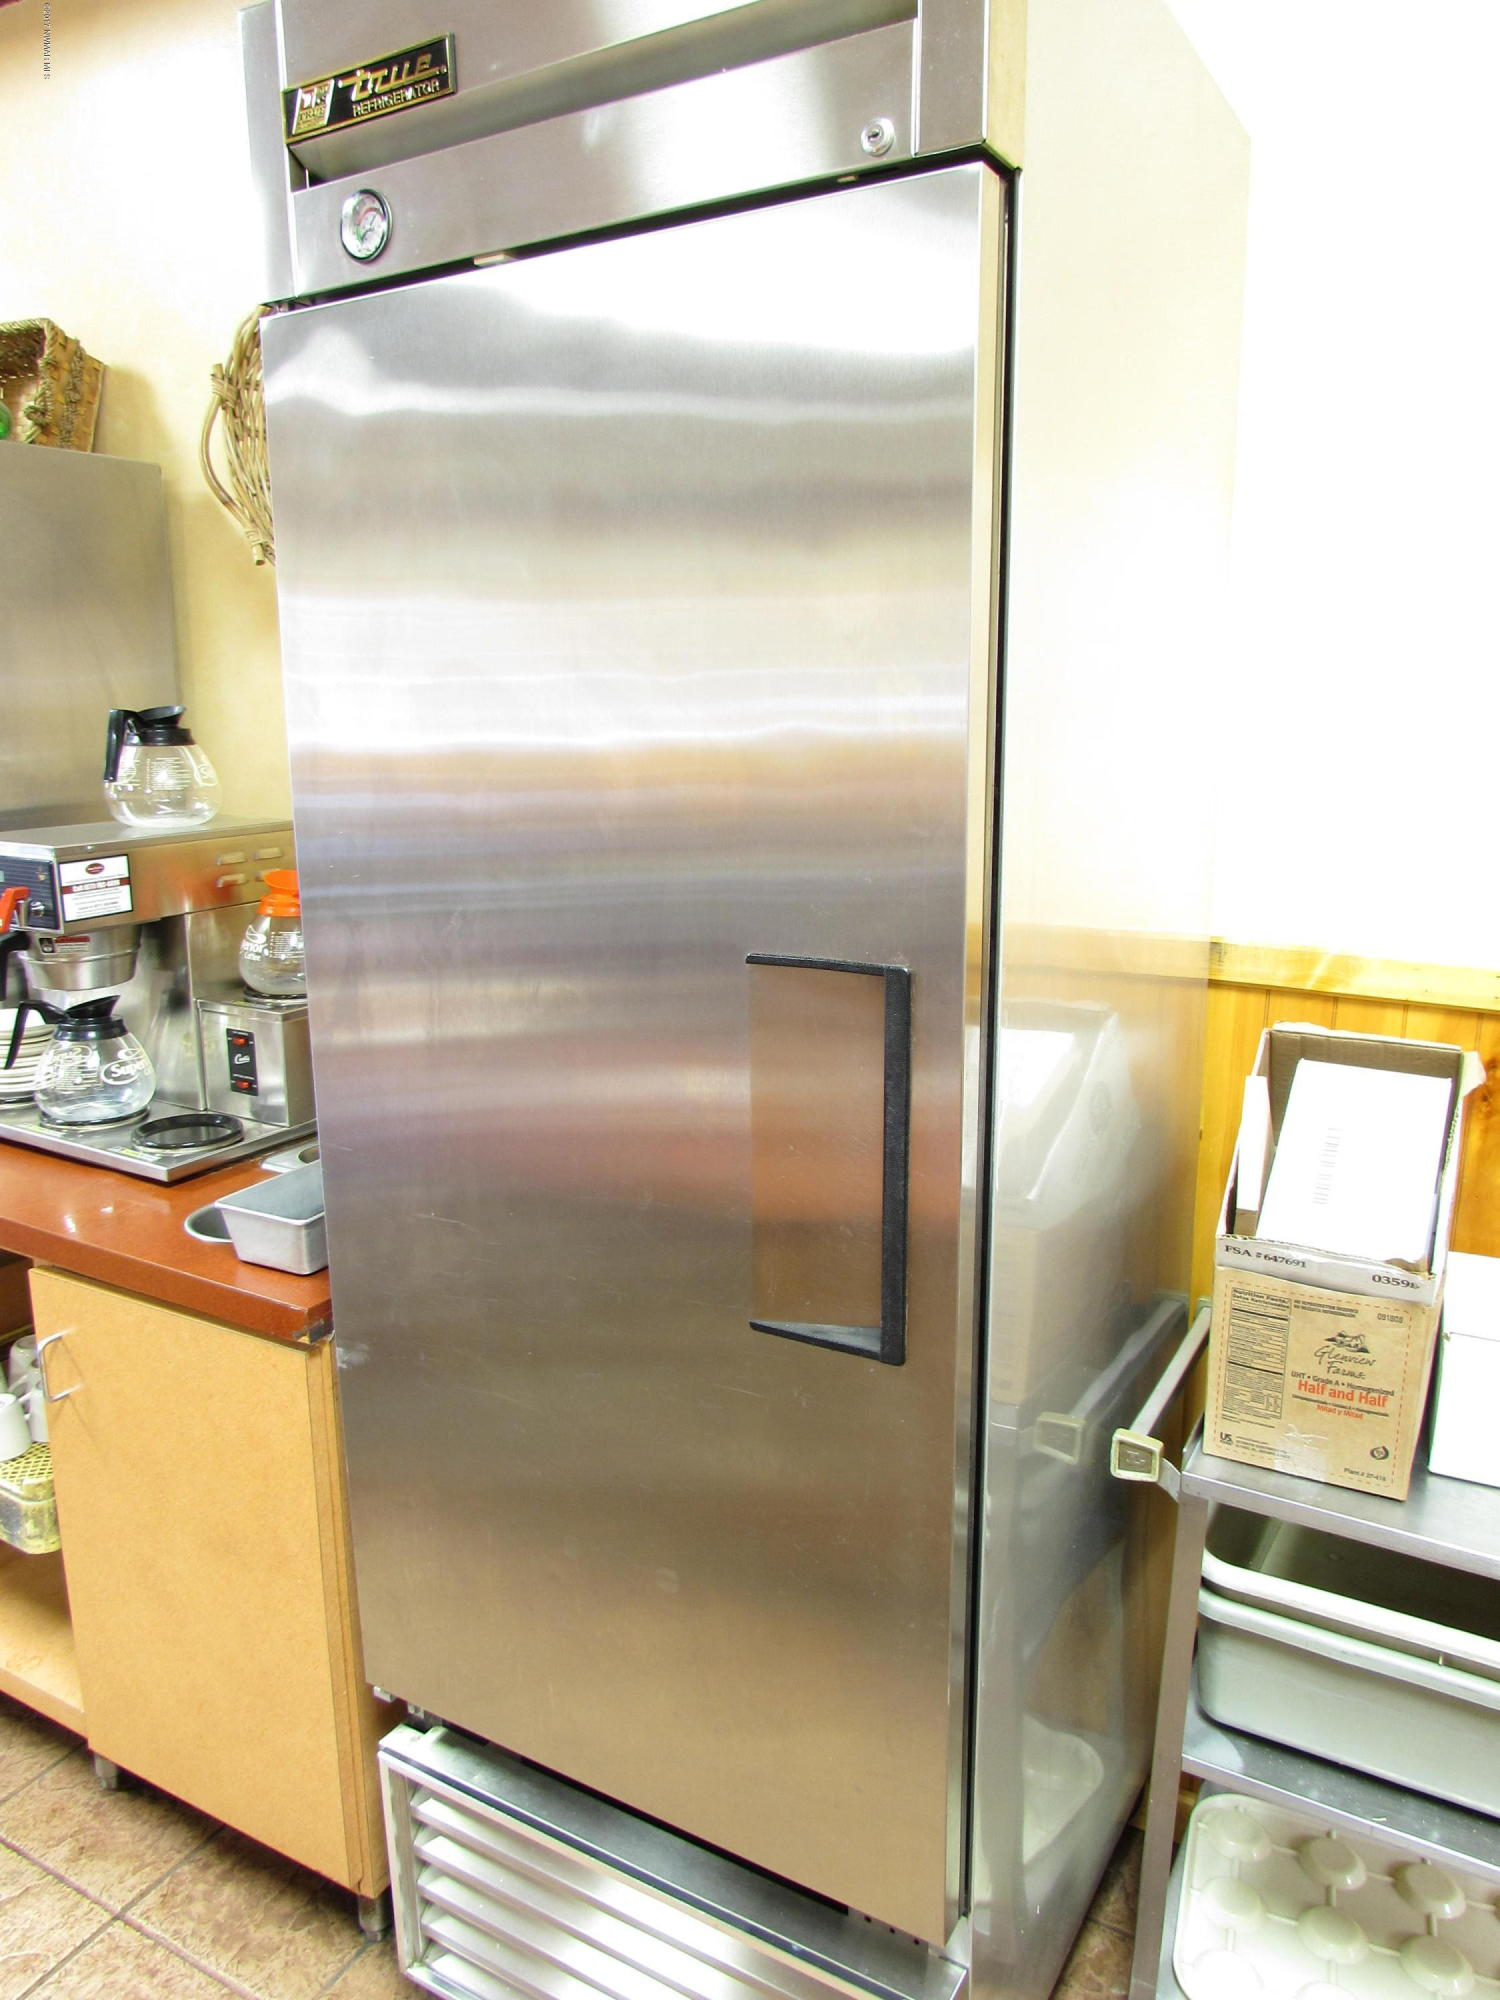 Upright Condiment Refrigerator - View 1